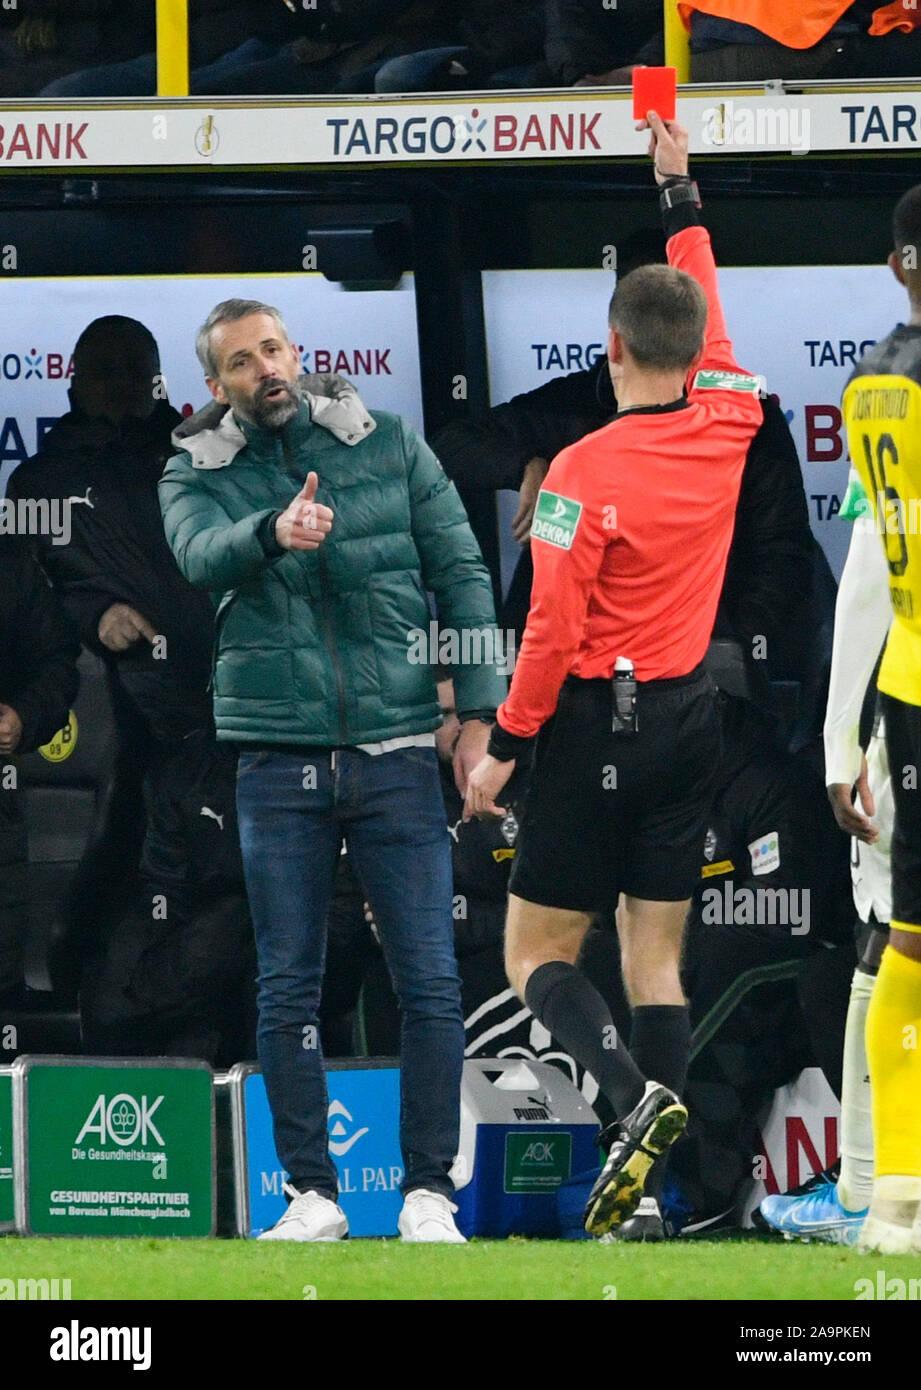 Signal Iduna Park Dortmund Germany 30 10 2019 Football German Dfb Cup Season 2019 20 Matchday 2